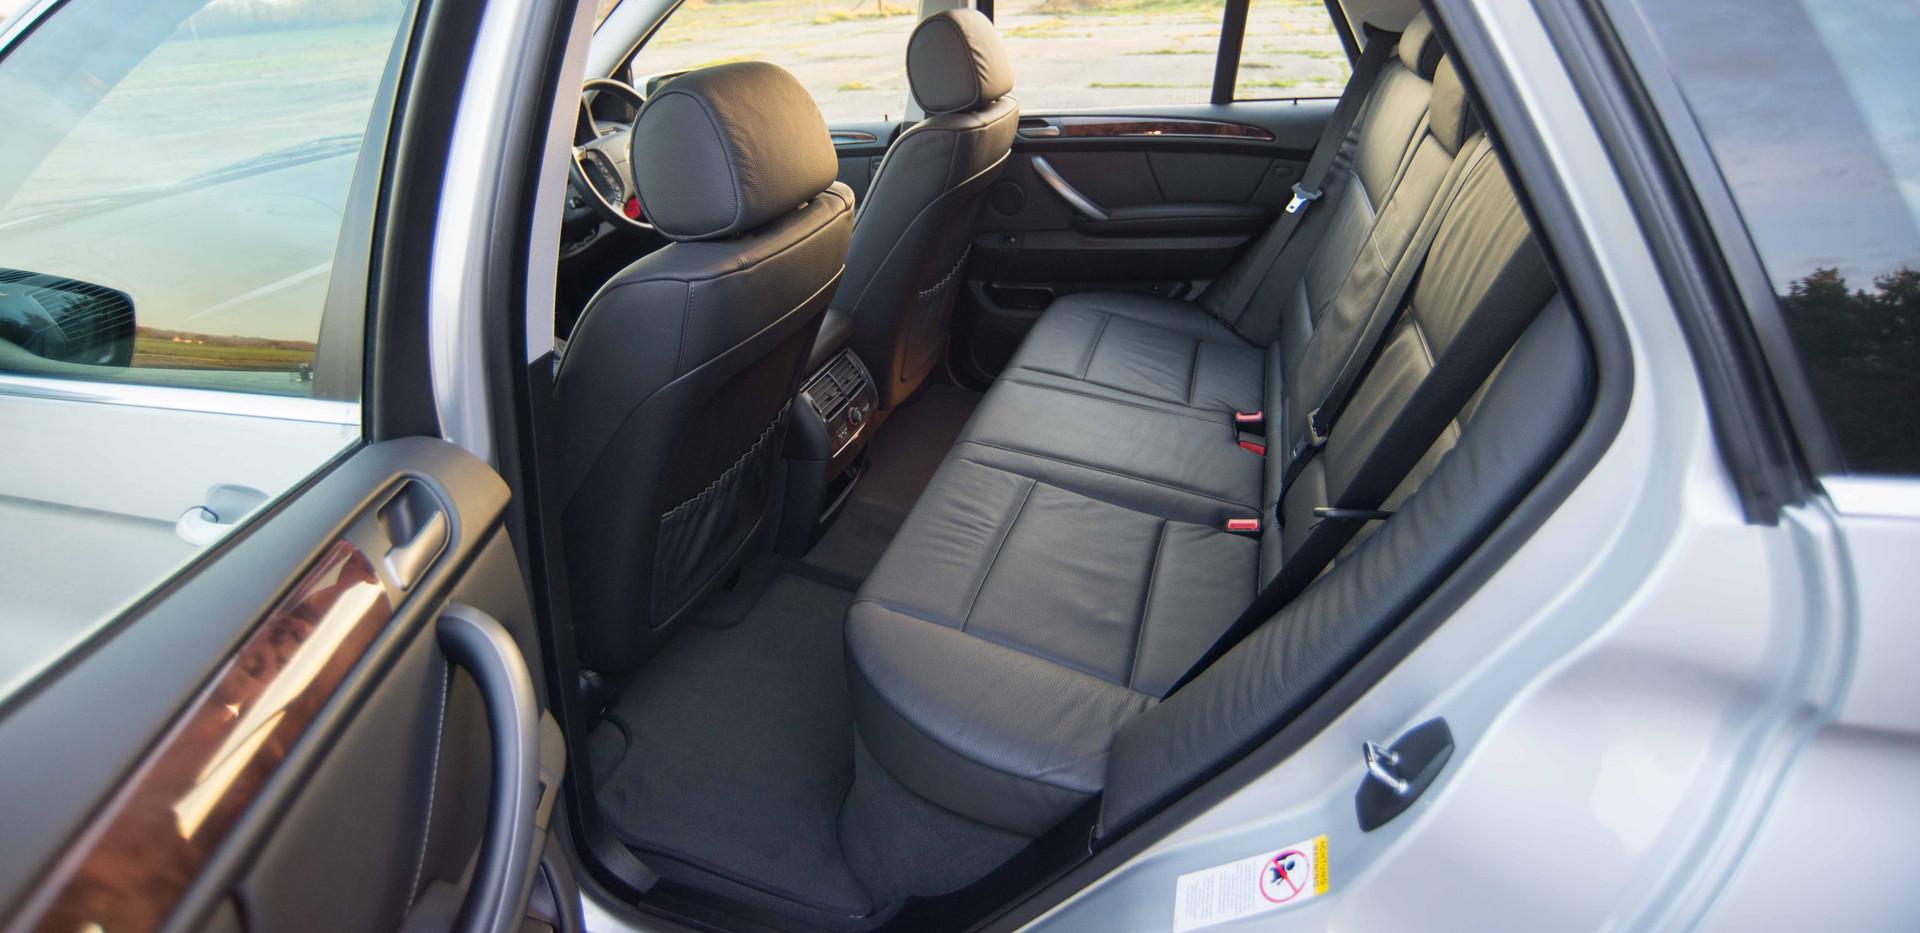 BMW E53 X5 4.4i For Sale UK London  (13